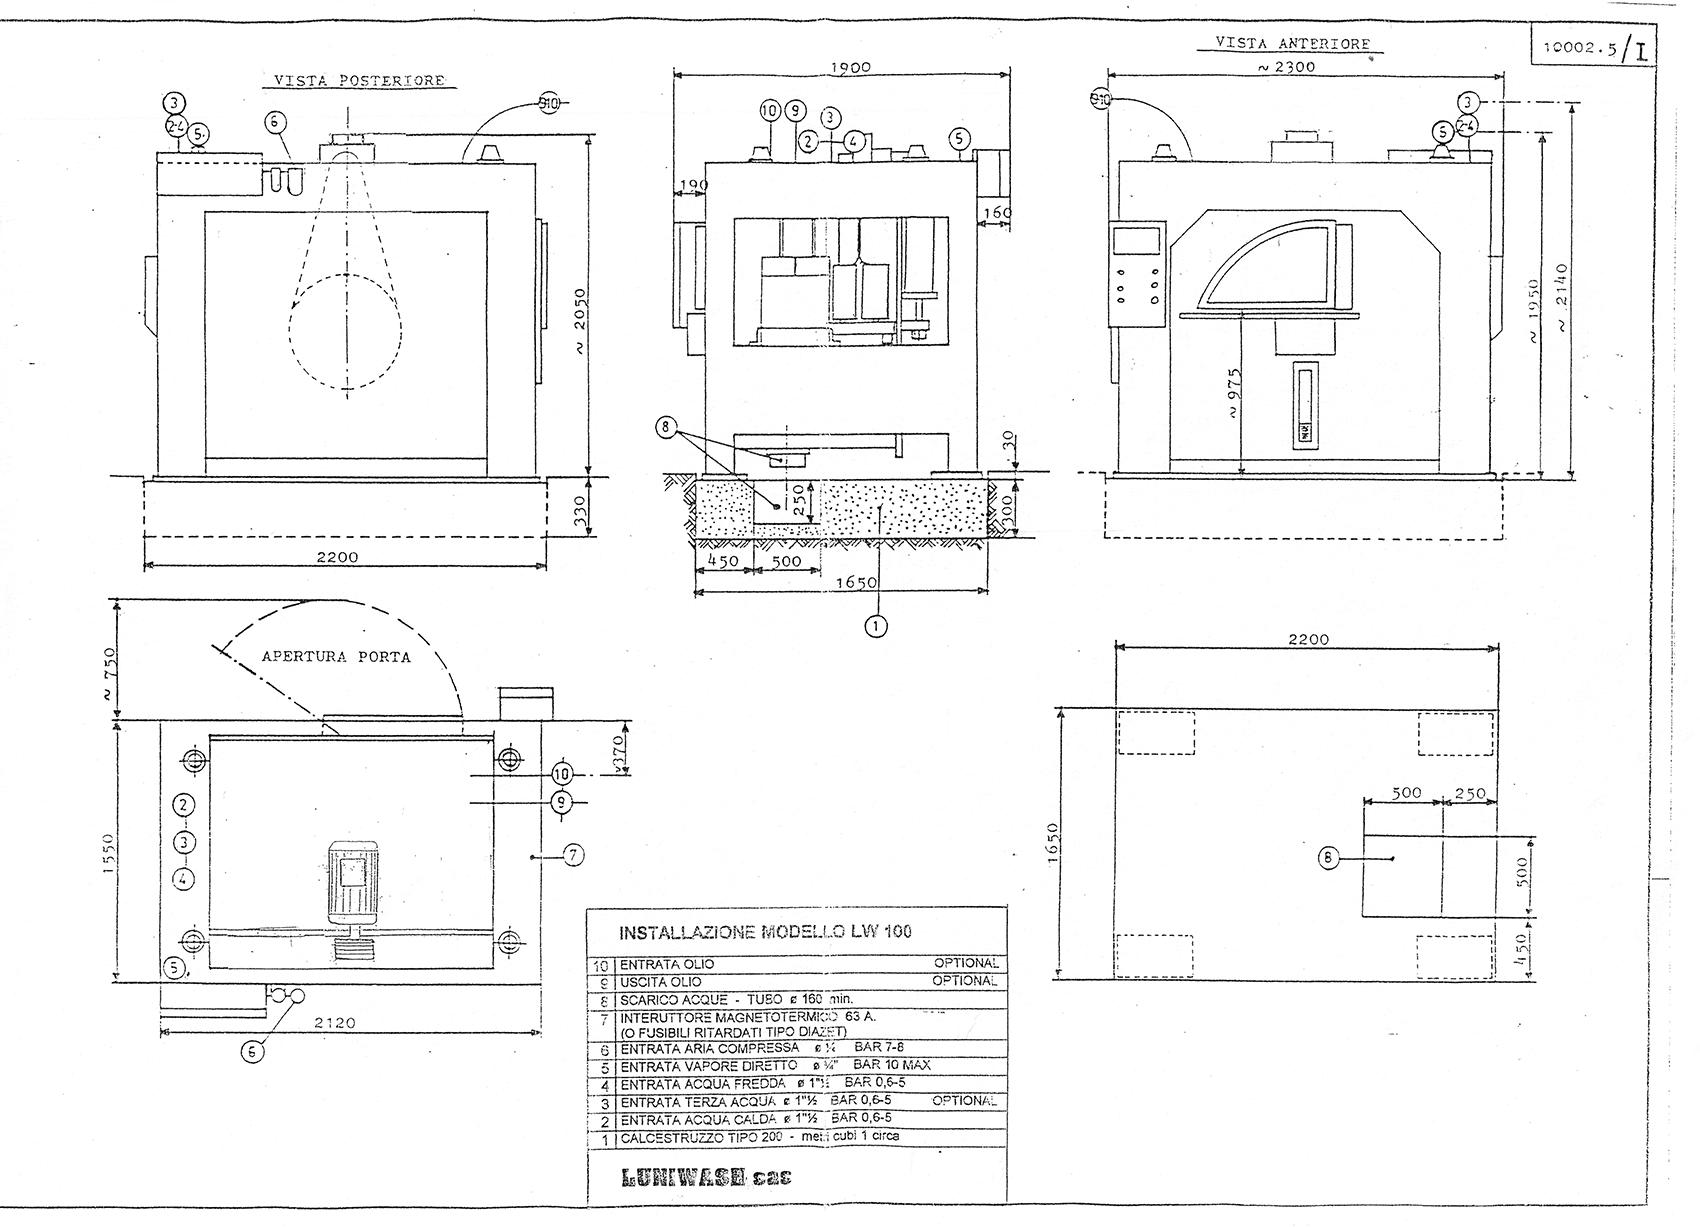 Schema Elettrico Motore Lavatrice : Scheda tecnica lavatrice industriale lw luniwash